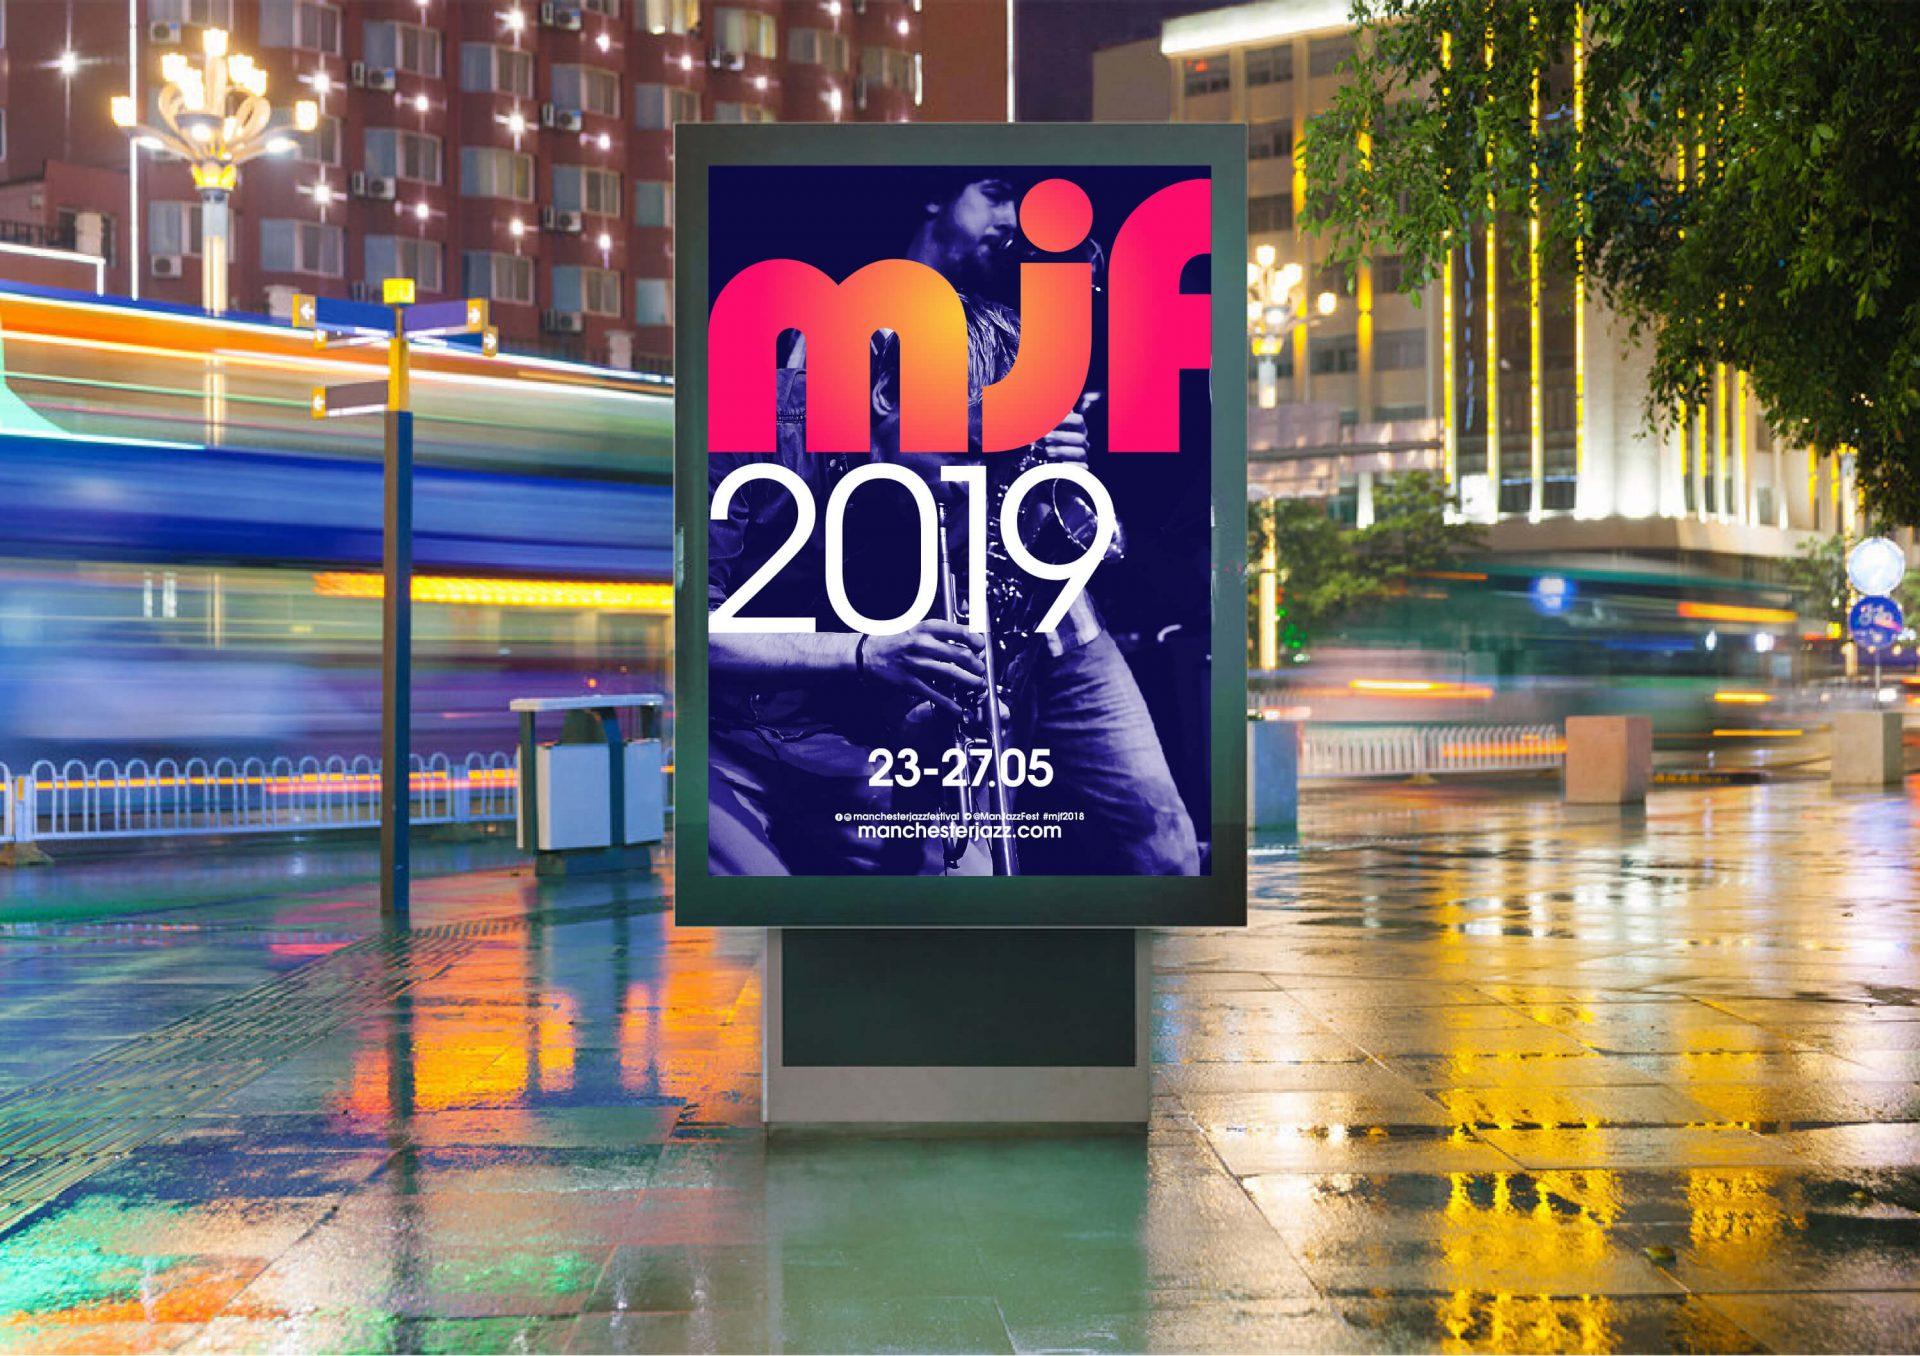 Manchester Jazz Festival